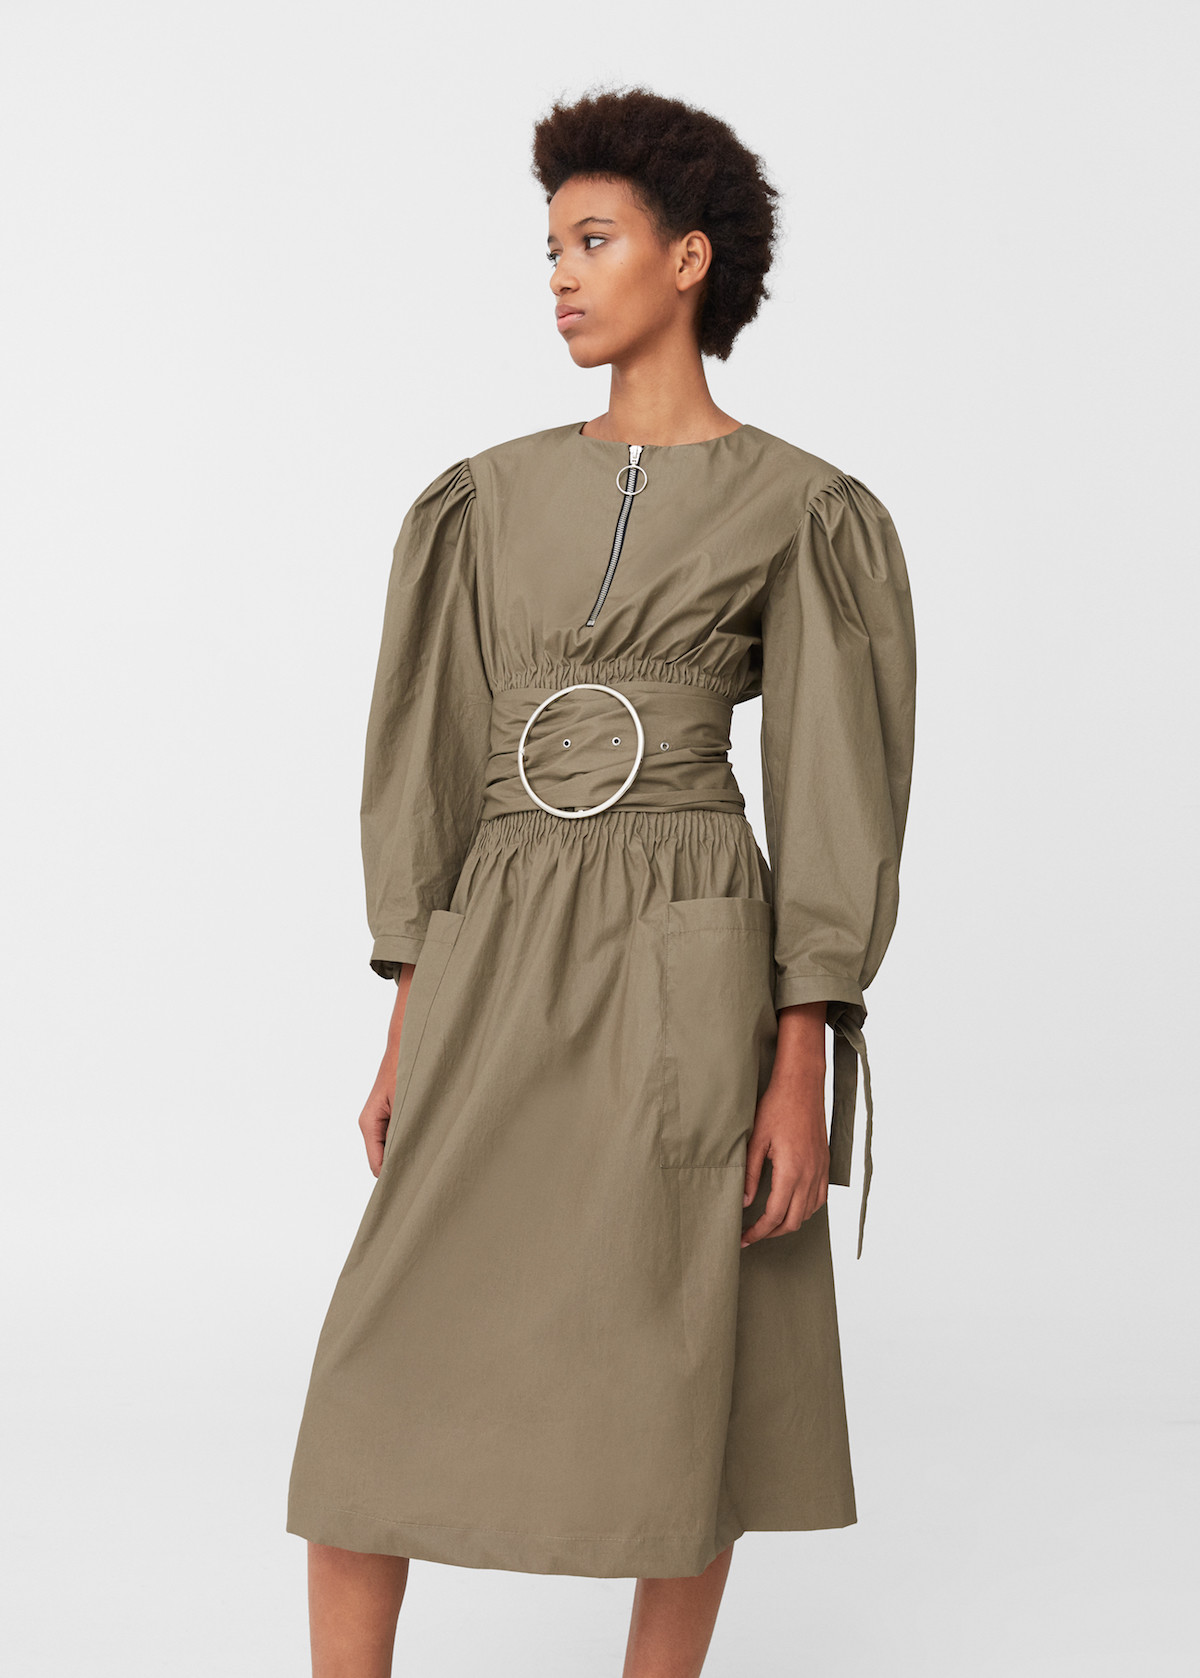 Foto de Mango fashion frames lookbook (10/10)